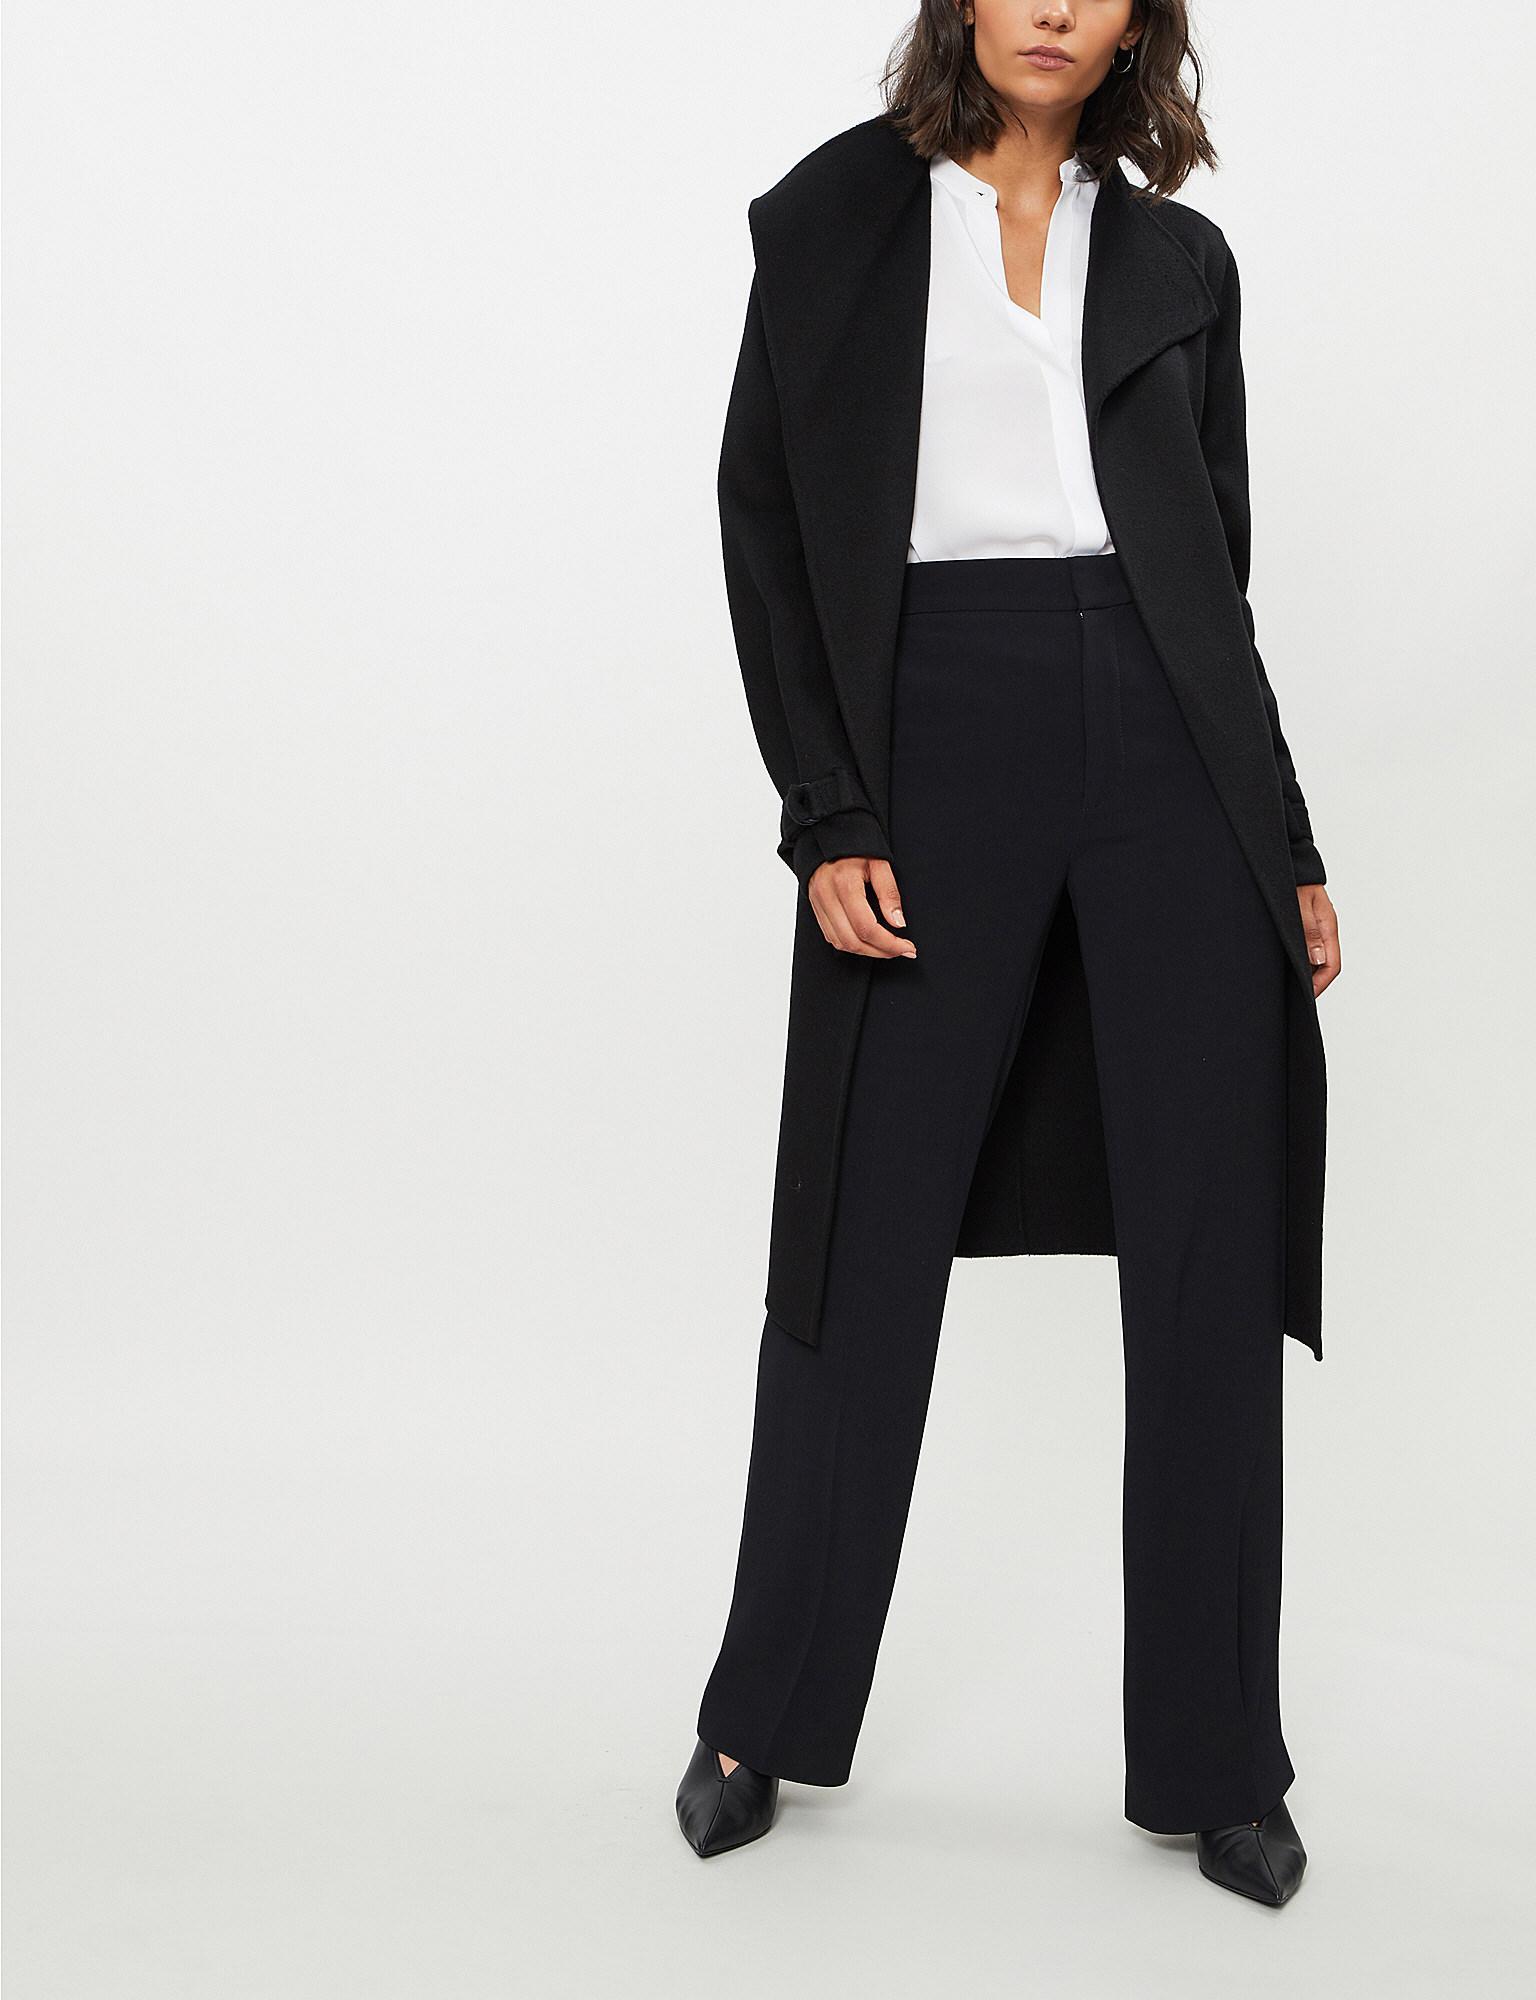 5e9f69cbf01 Lyst - JOSEPH Womens Black New Lima Wool And Cashmere-blend Coat in ...